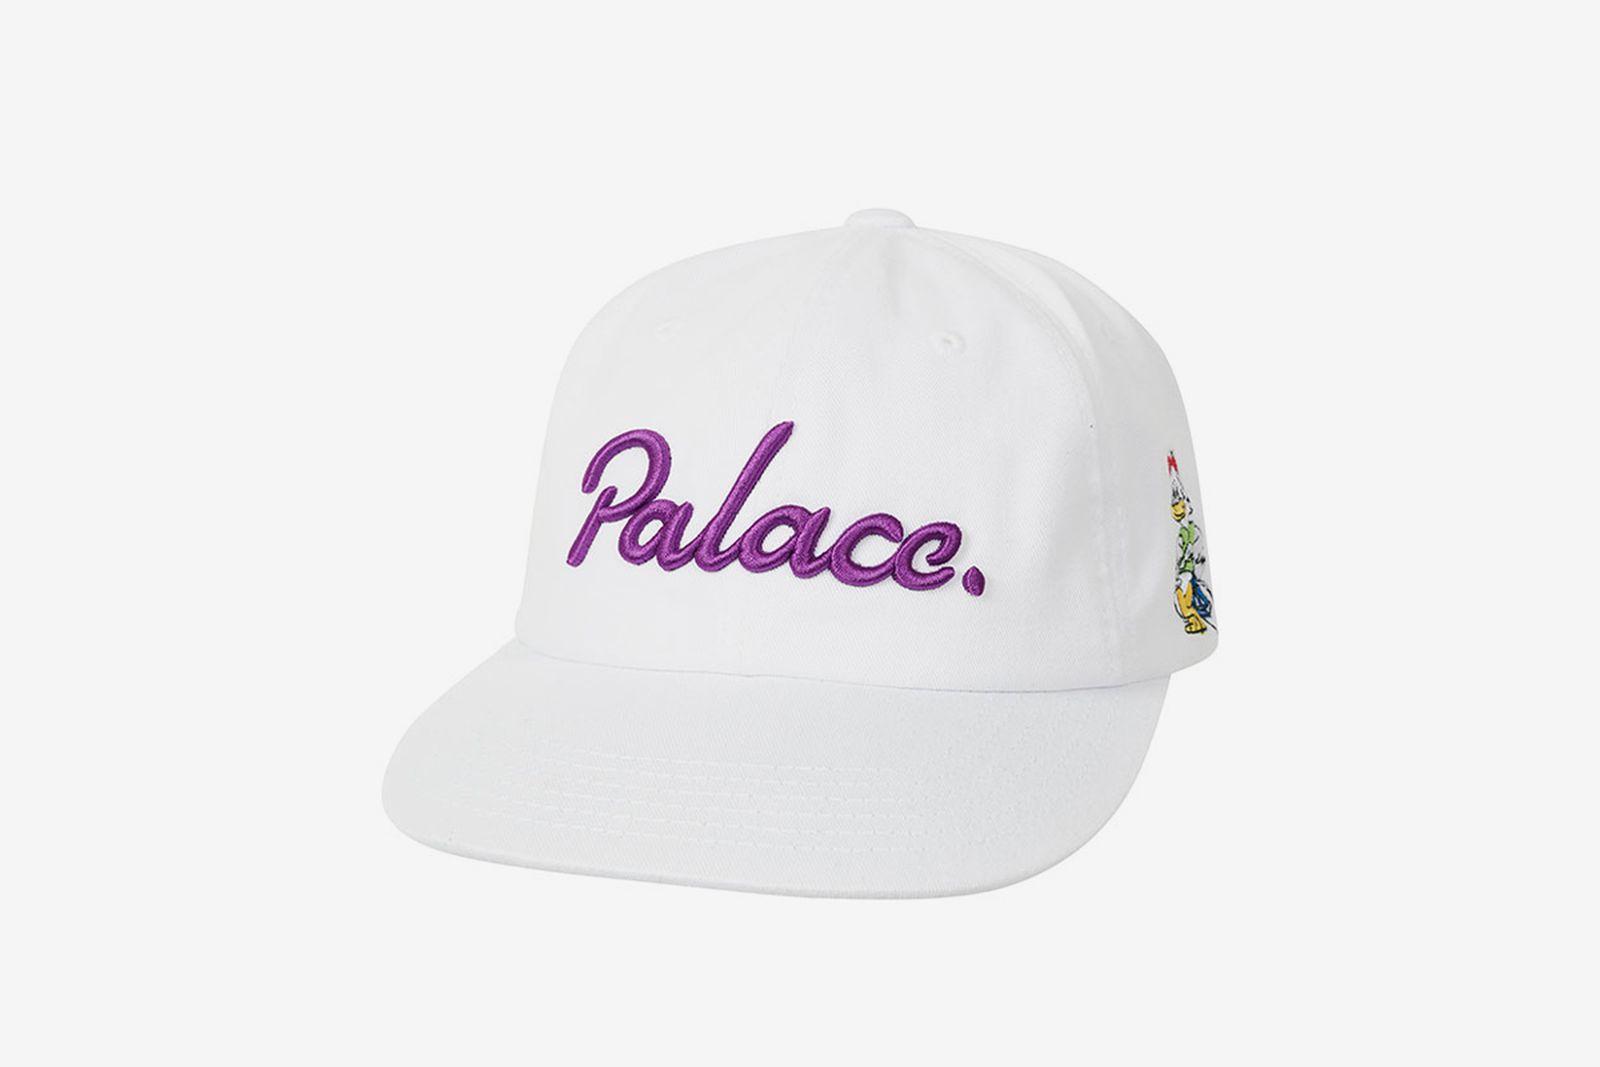 palace-rapha-products-12